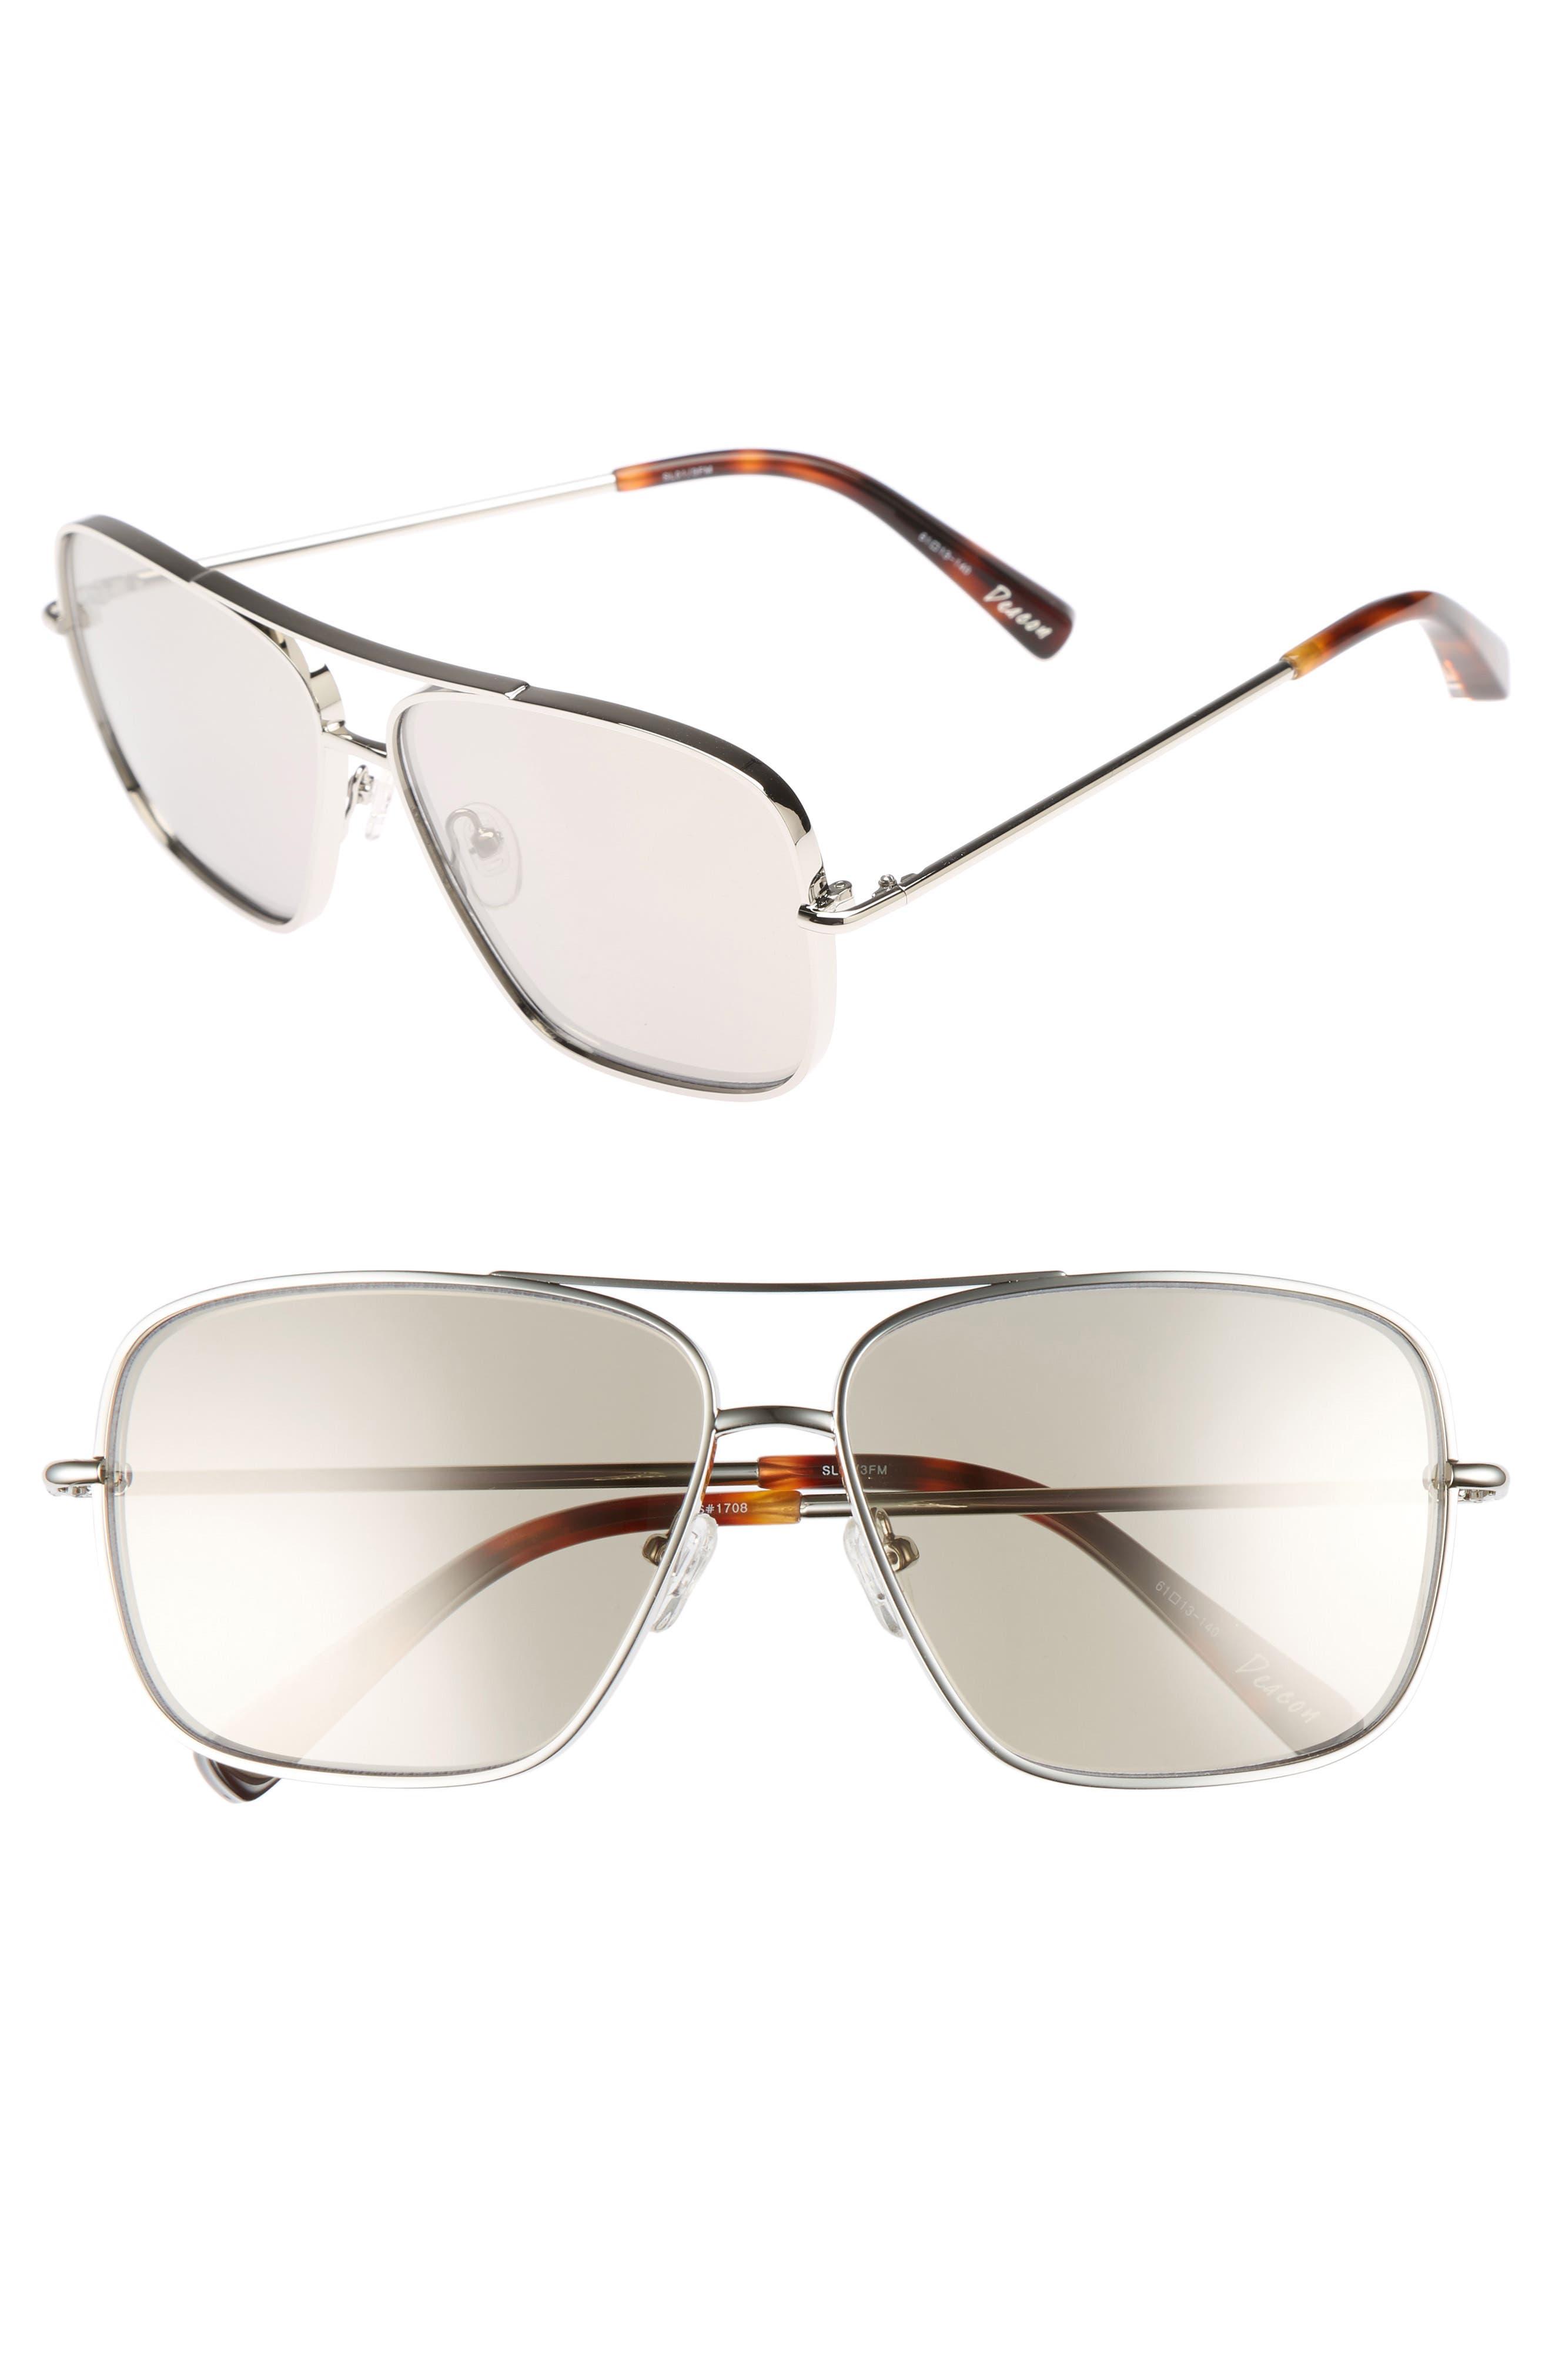 Deacon 61mm Aviator Sunglasses,                             Main thumbnail 1, color,                             Silver